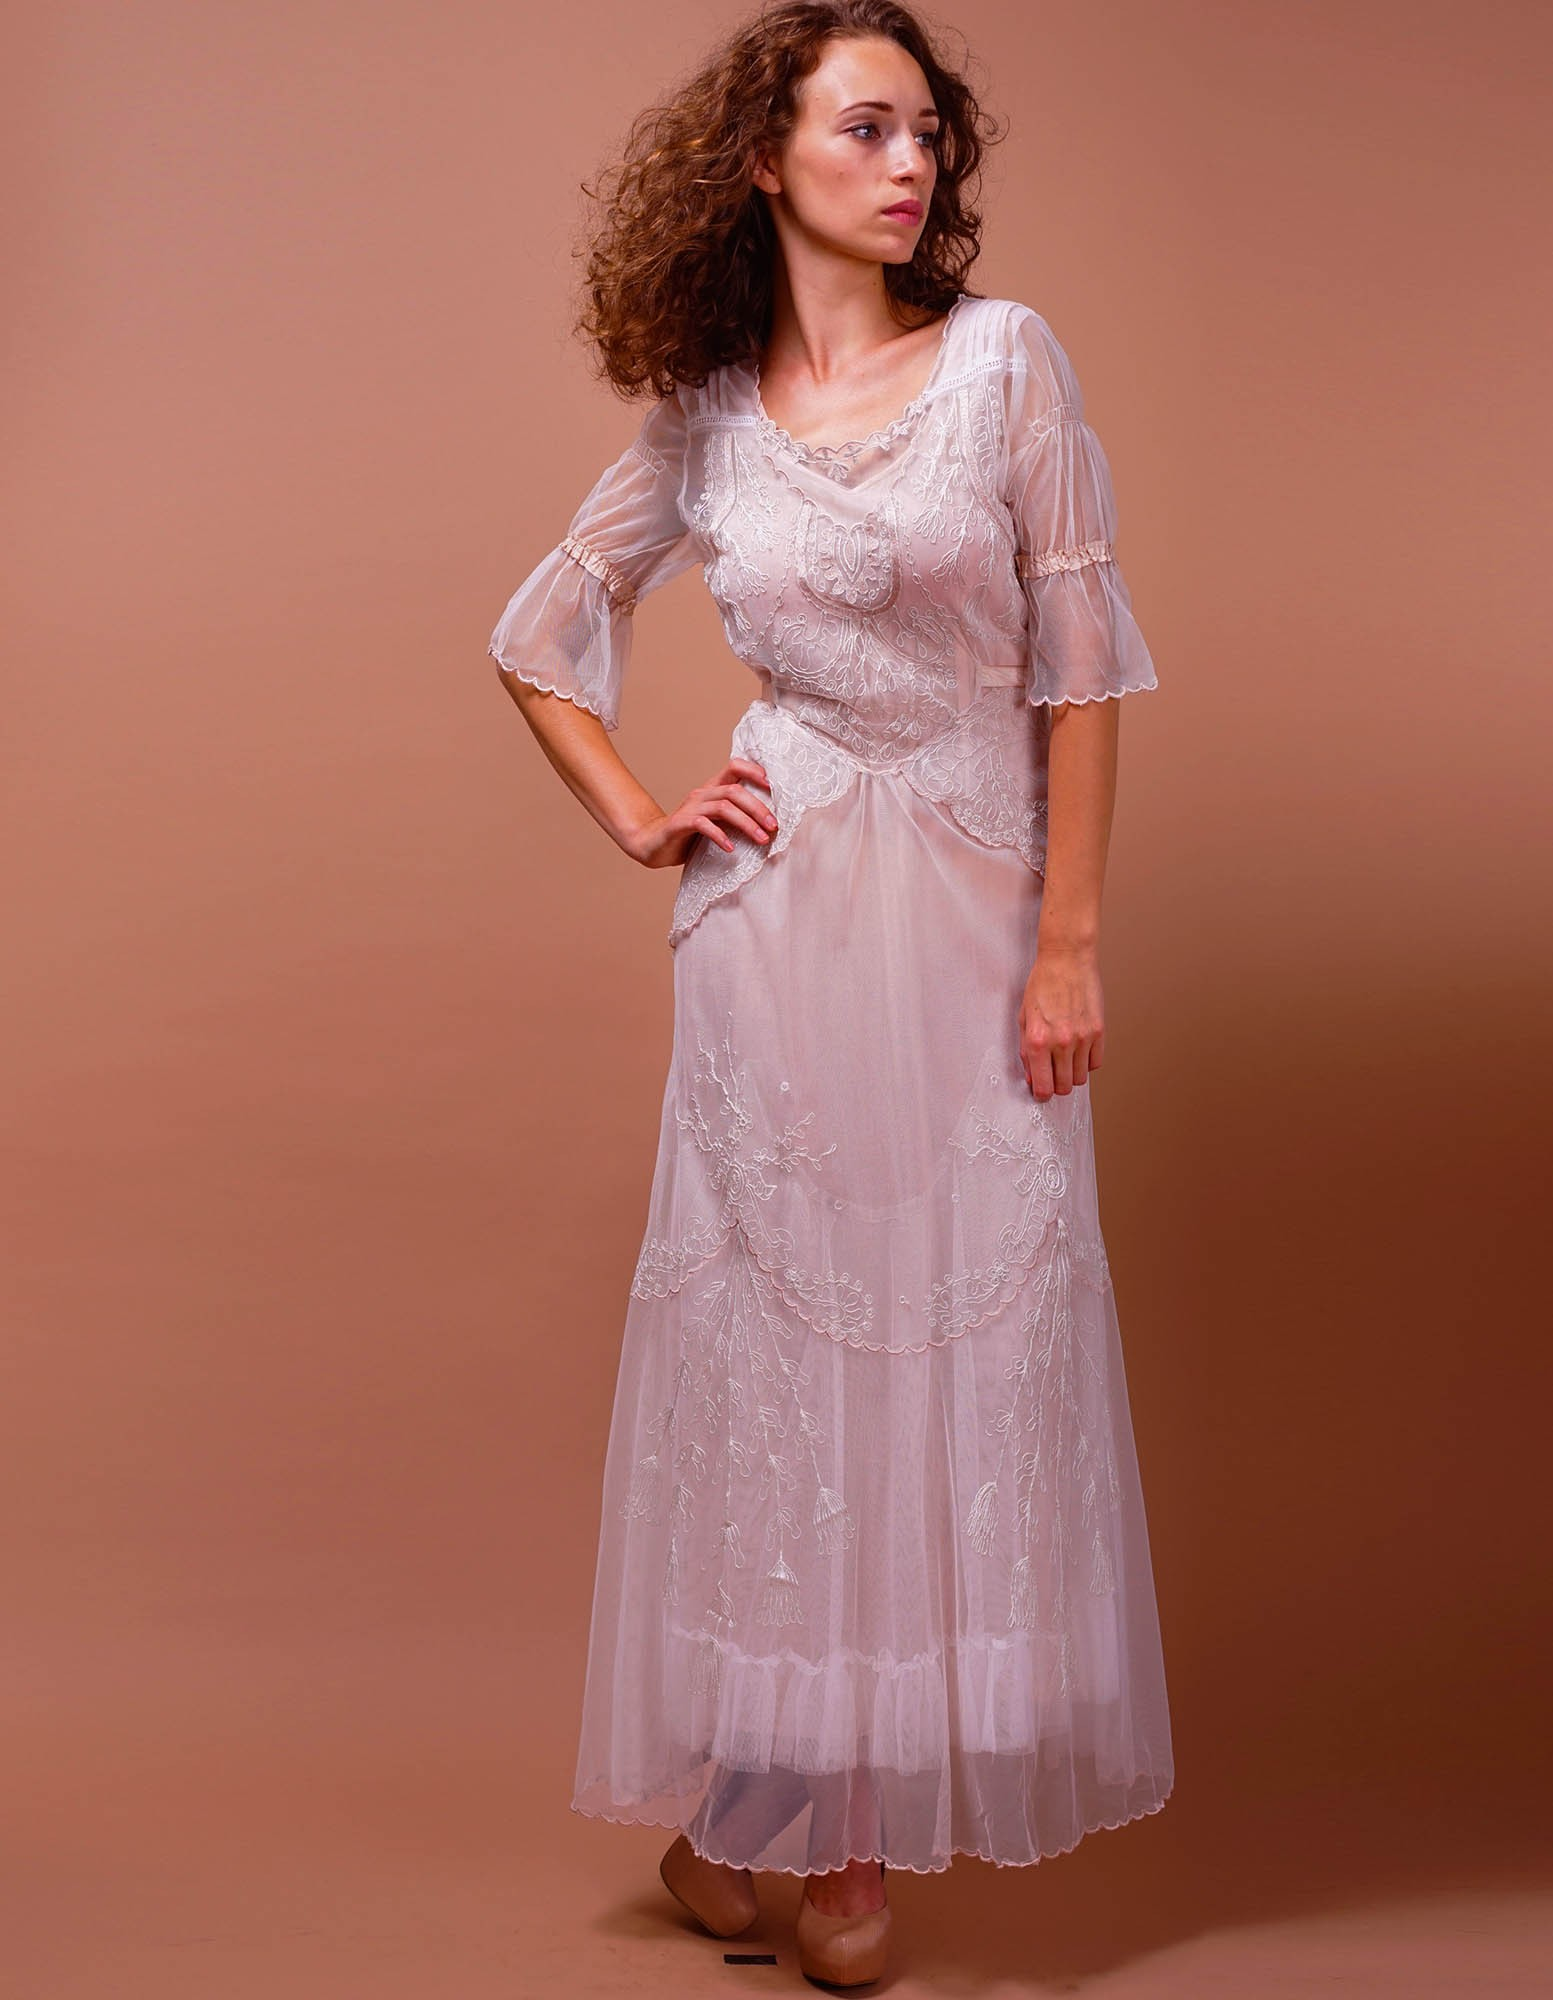 vintage inspired dresses cheap 70s retro dresses 28